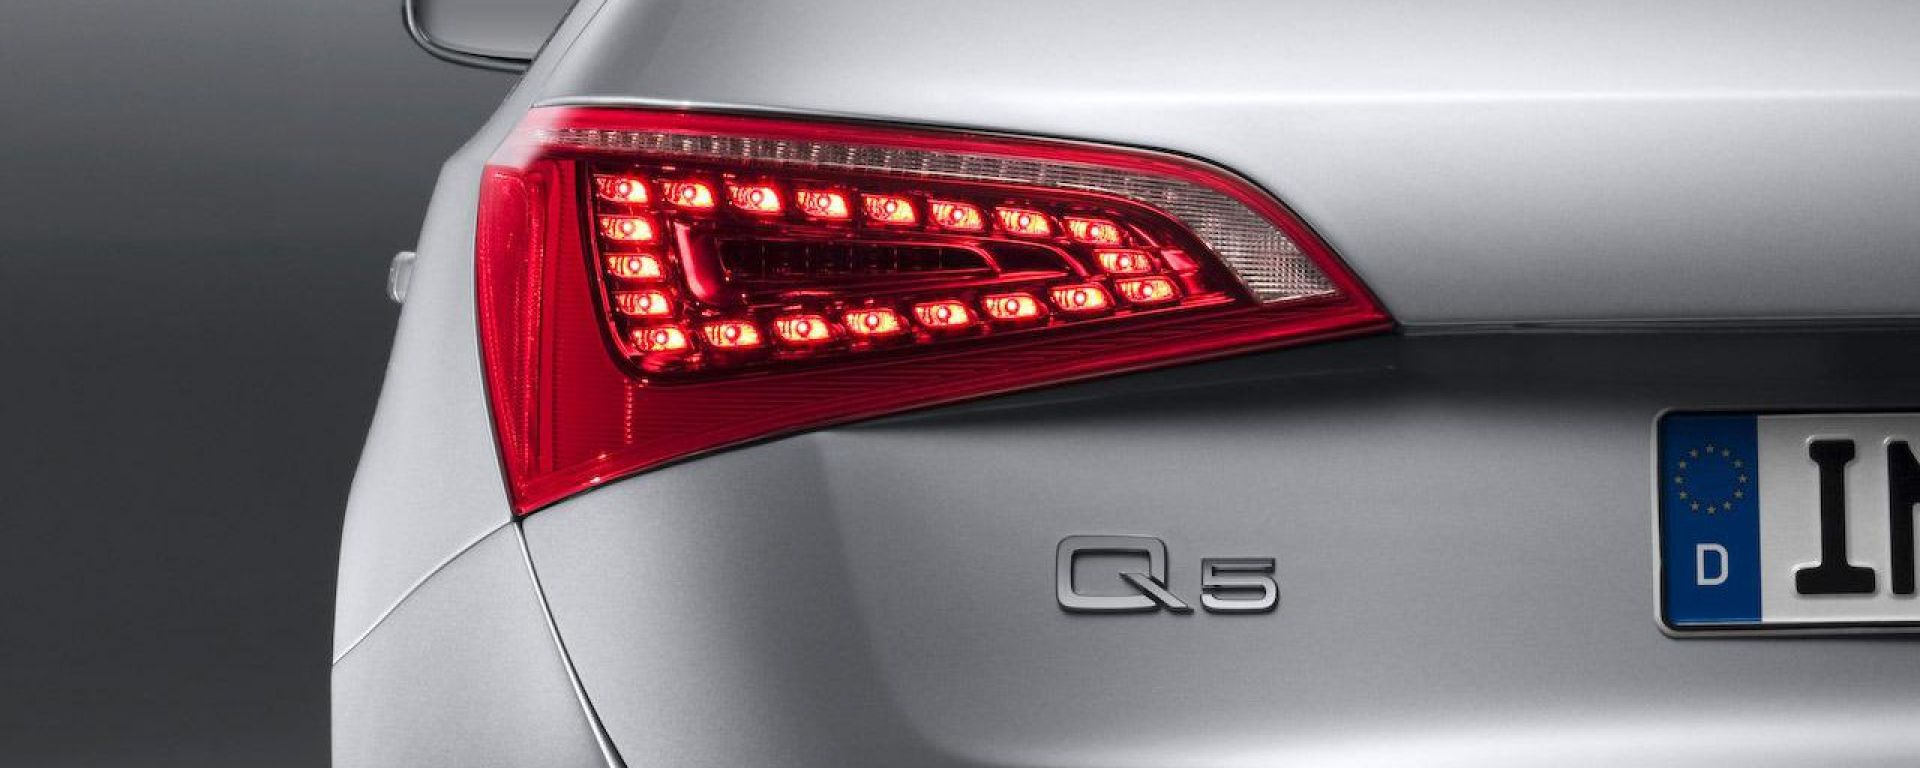 Dieselgate: secondo i test di Altroconsumo l'Audi Q5 emette più NOx